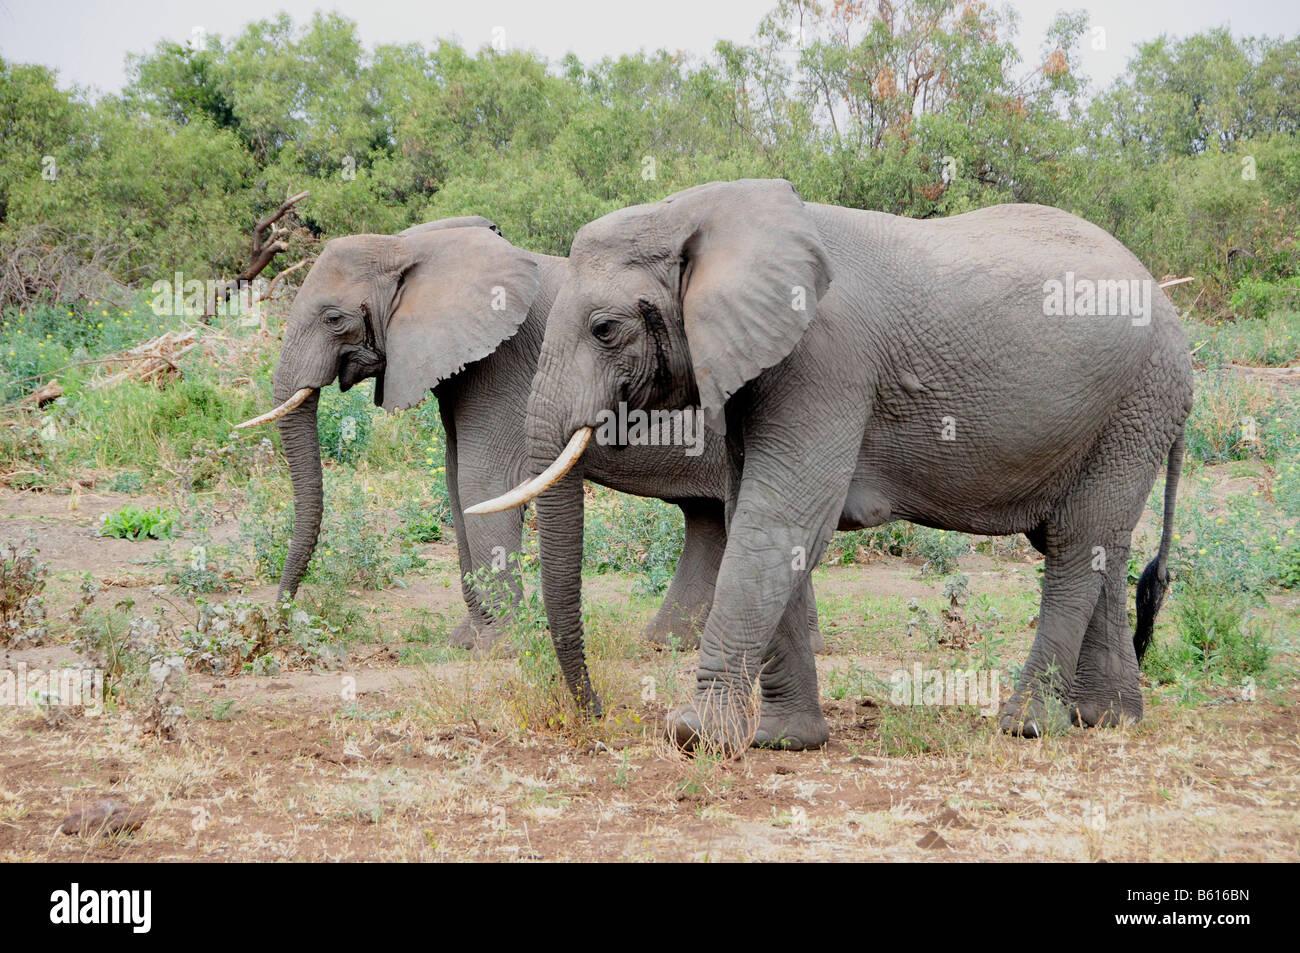 African Bush Elephants (Loxodonta africana), Lake Manyara National Park, Tanzania, Africa - Stock Image